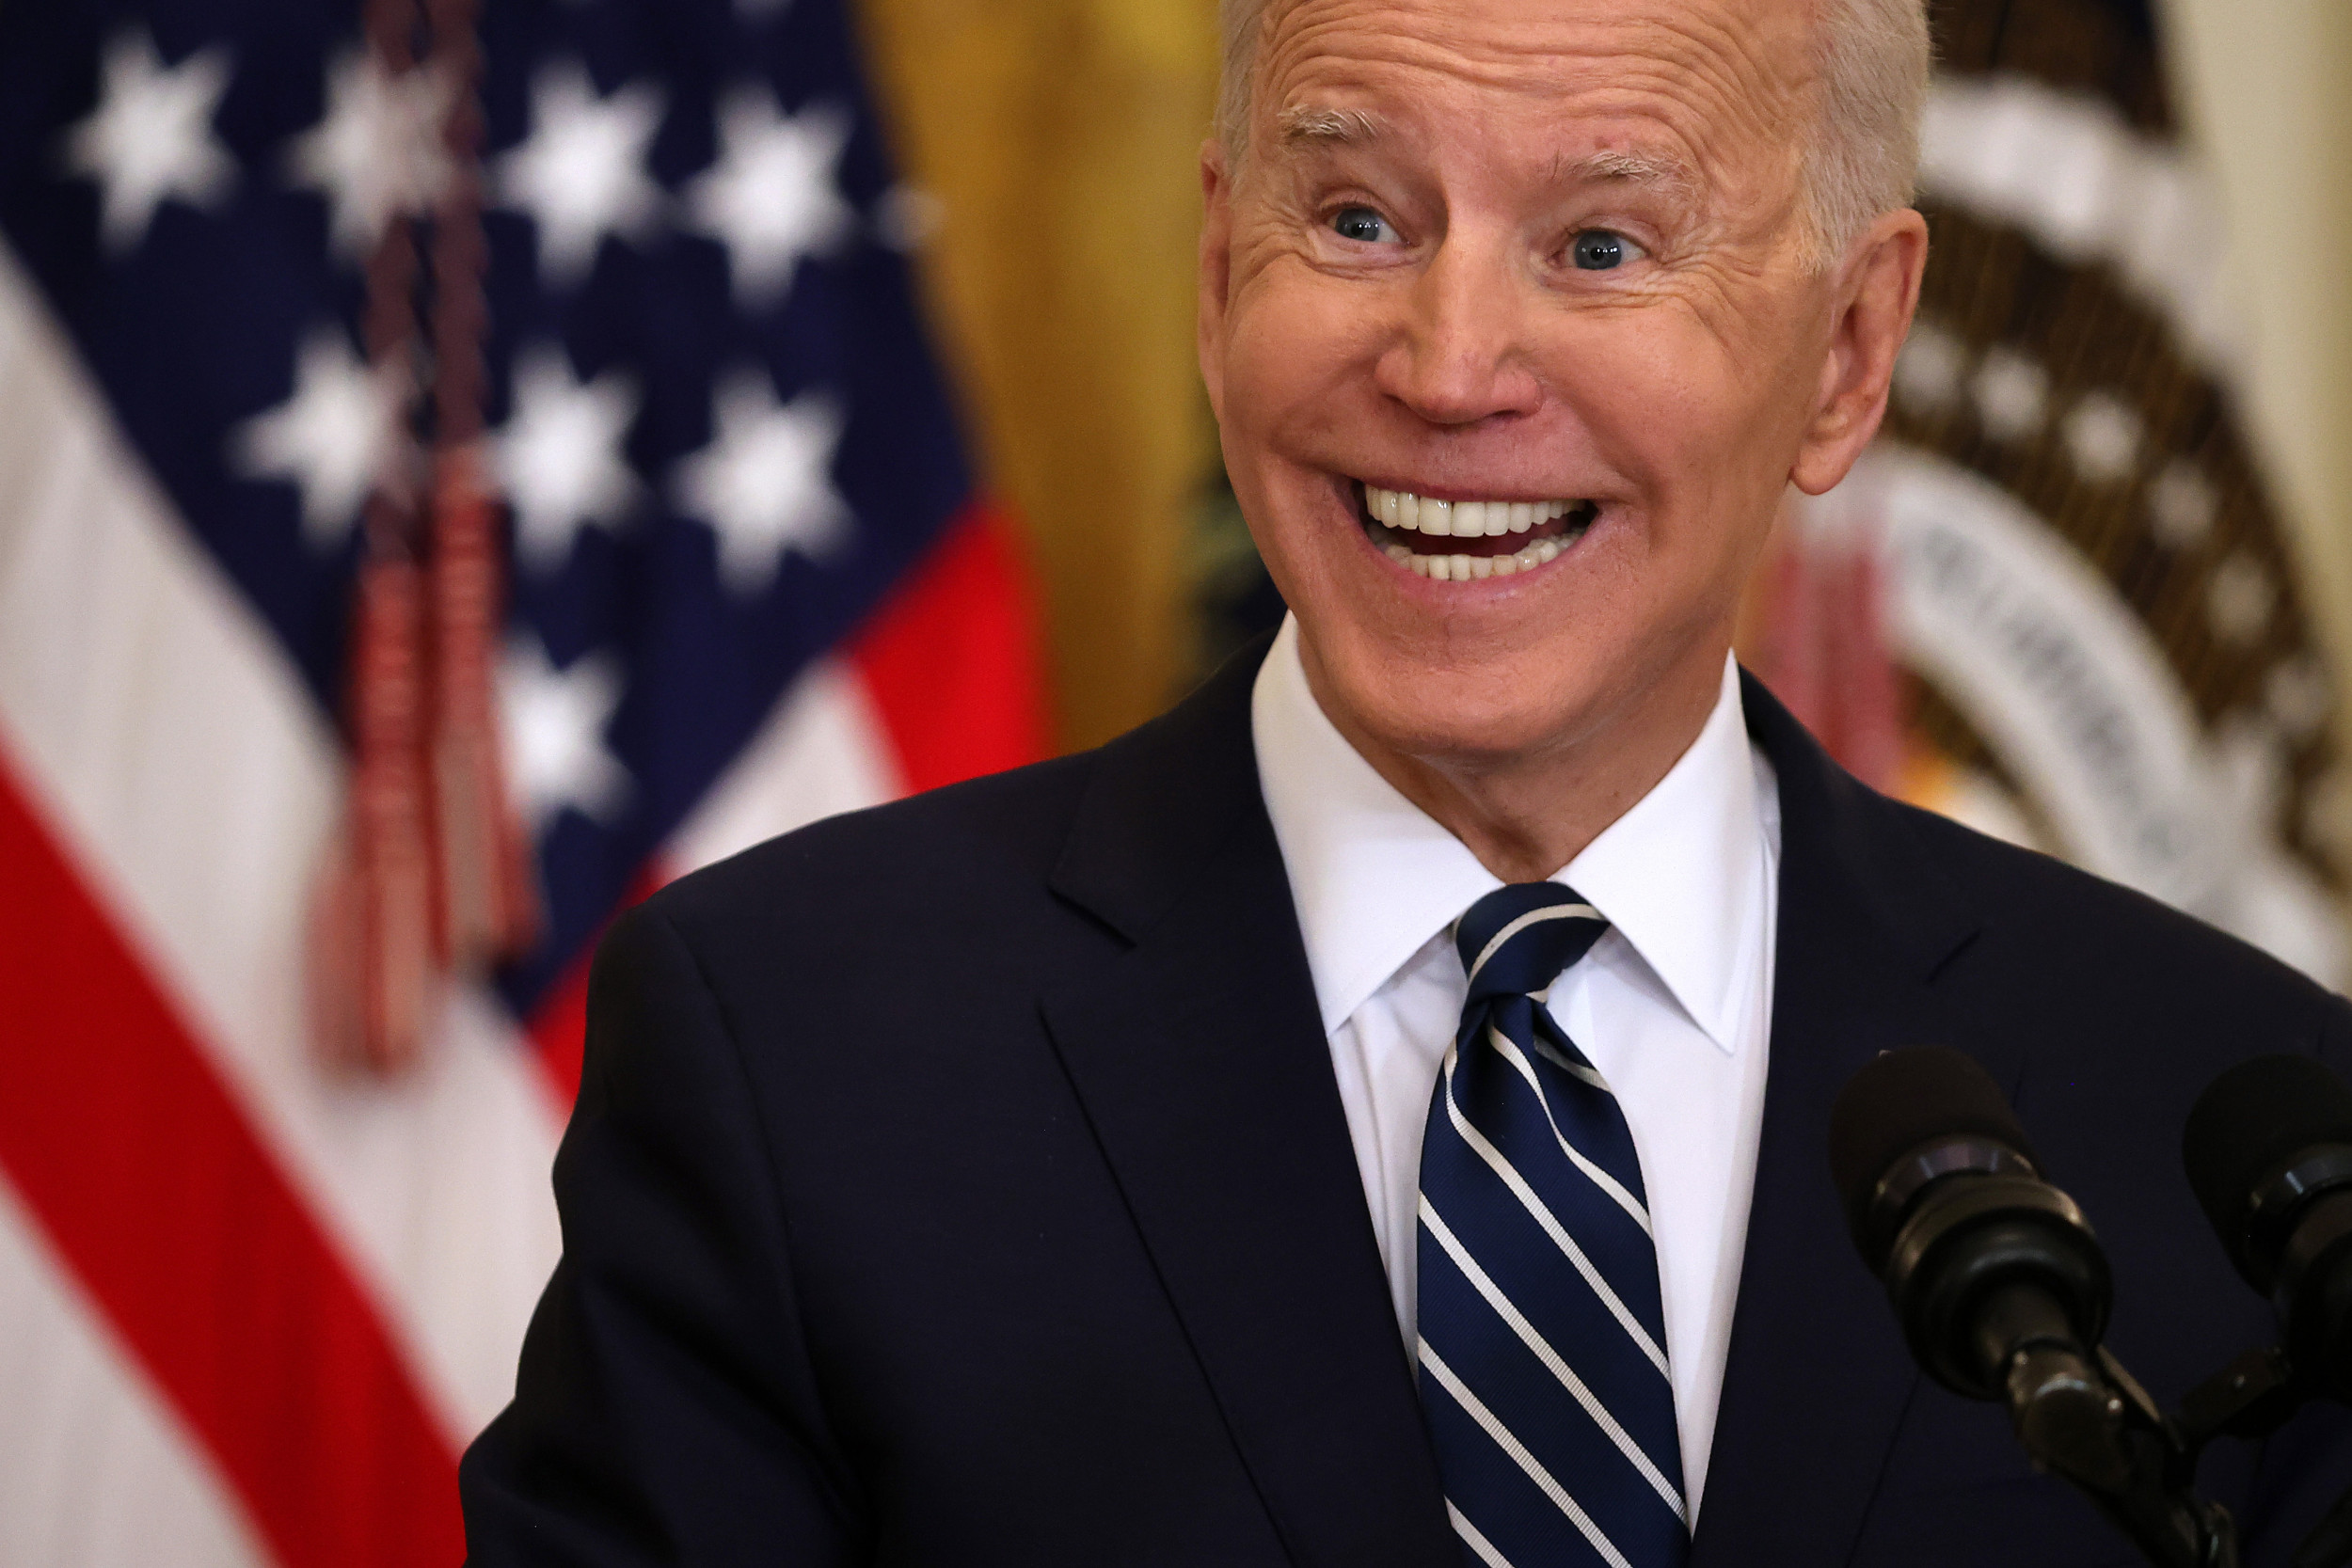 Joe Biden39s Press Conference Cheat Sheet Divides Opinion